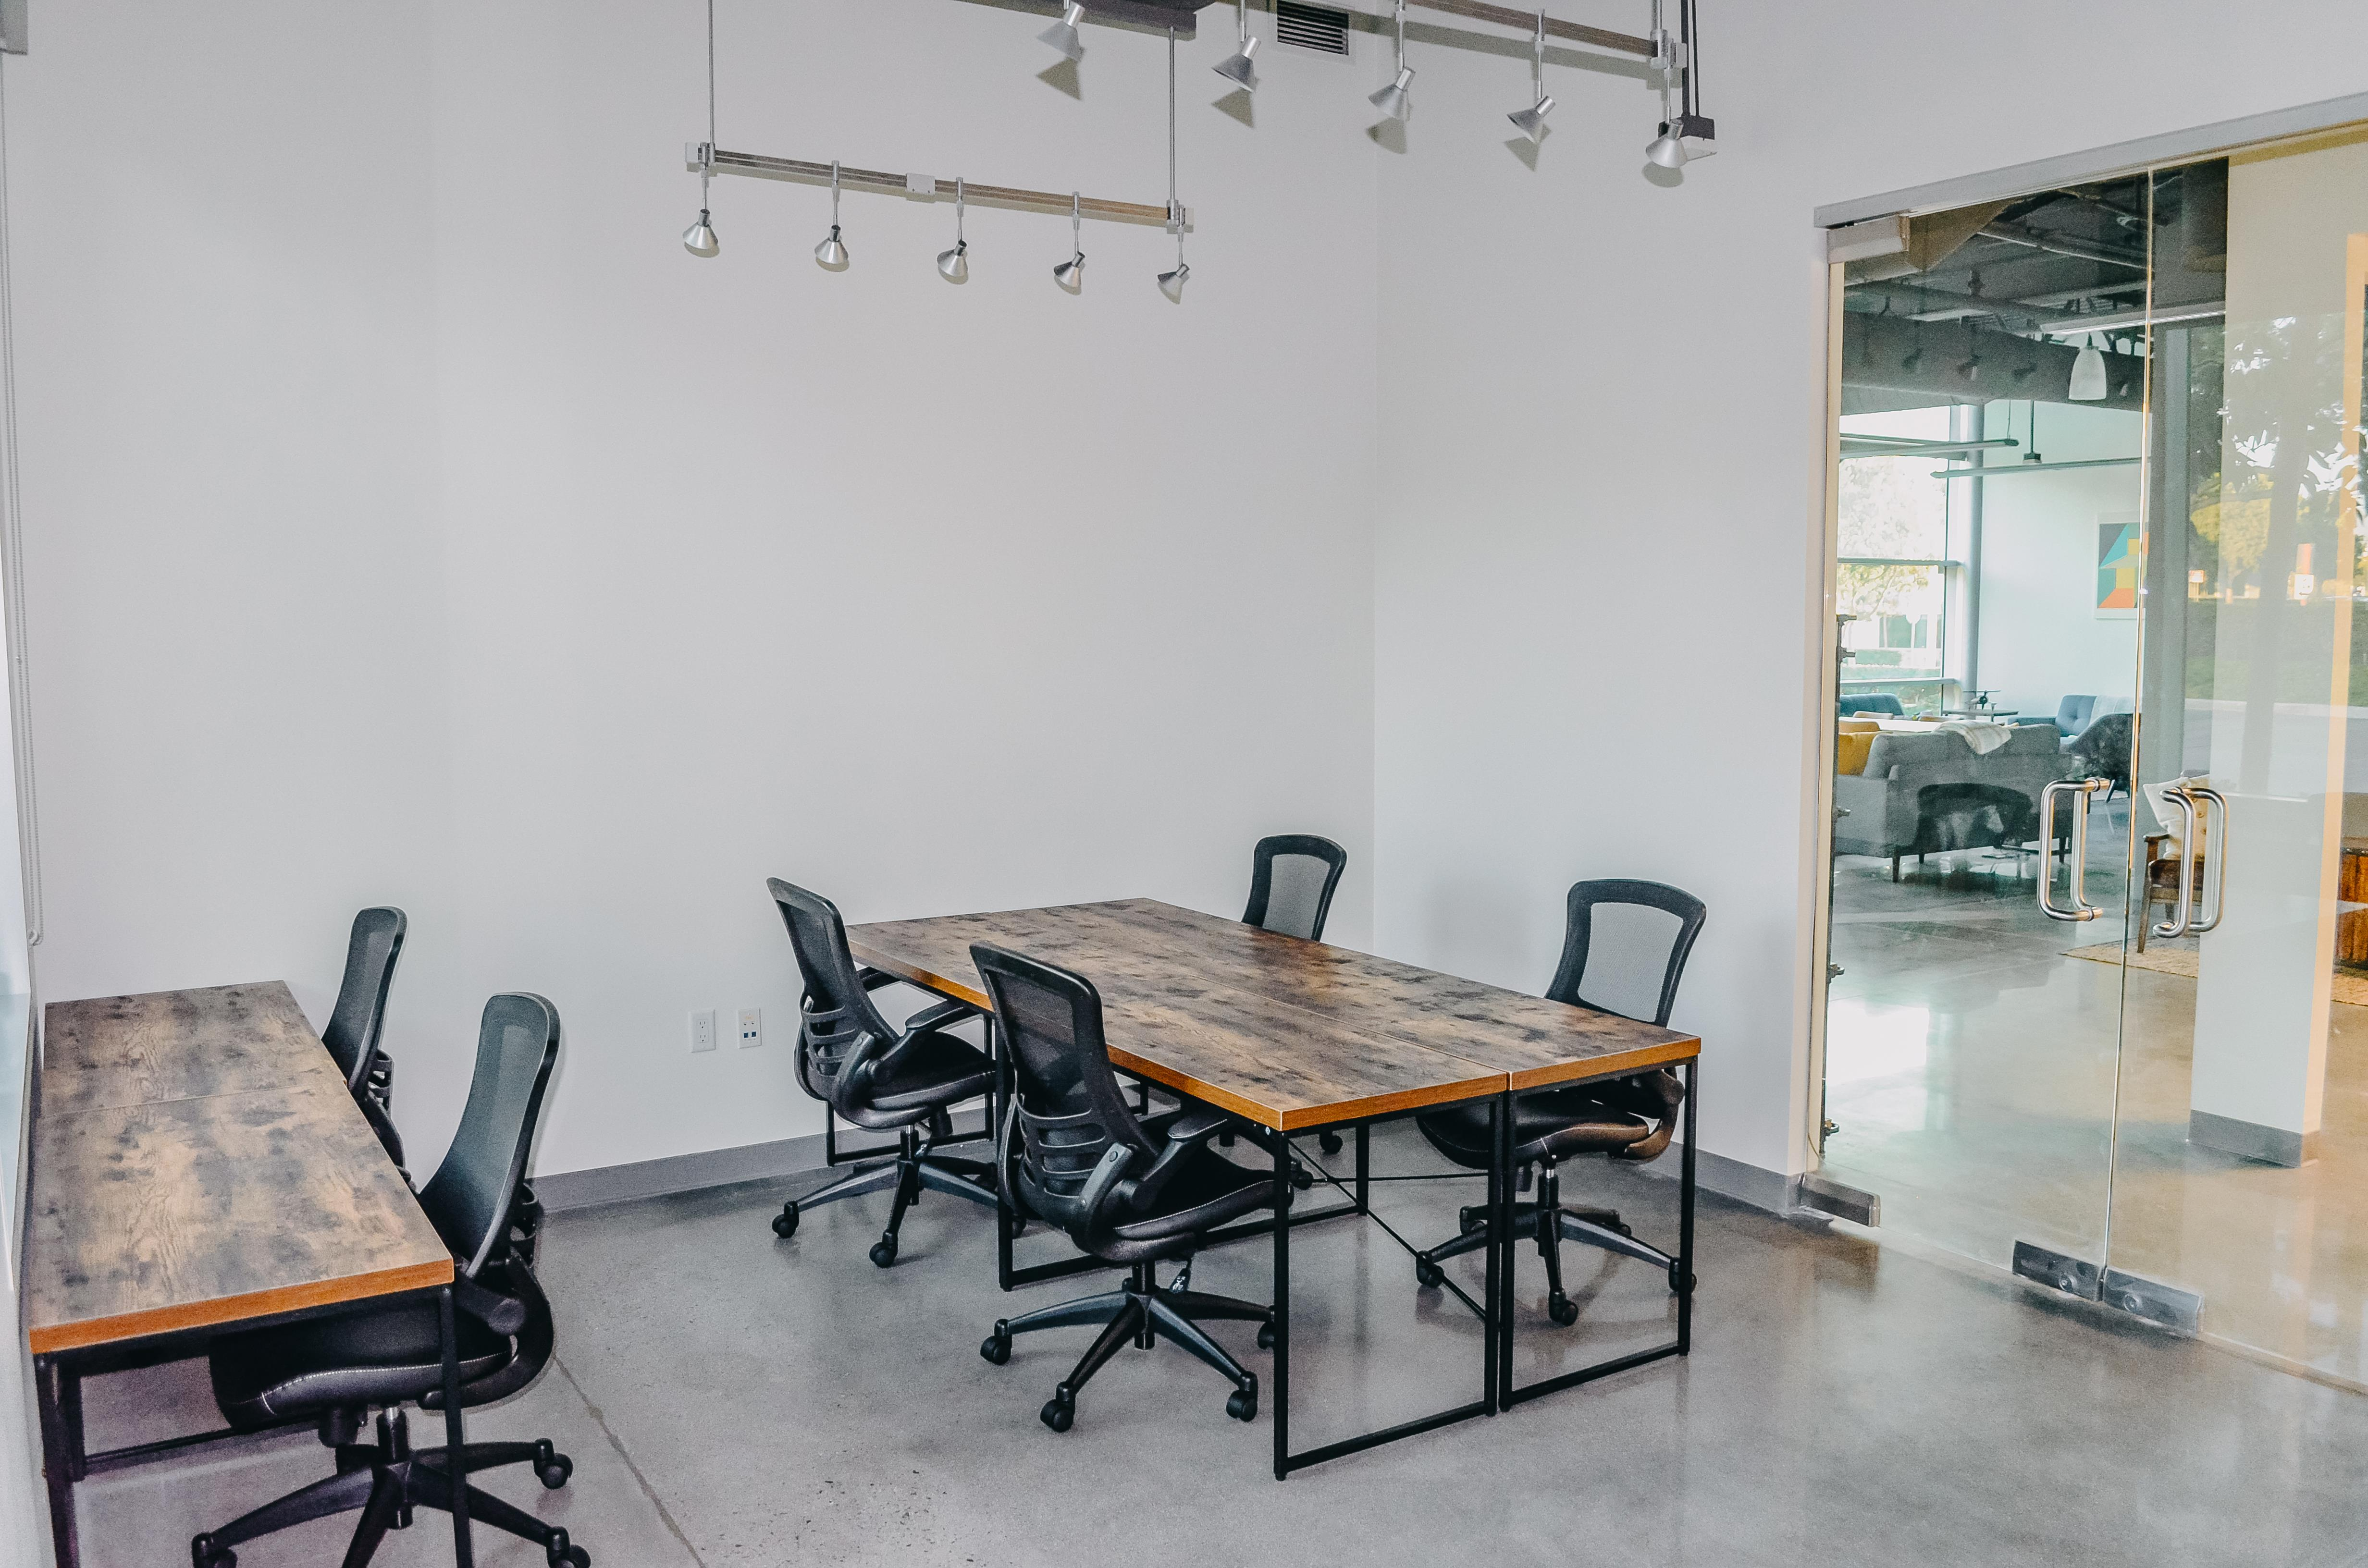 Intela-Hub - Intela Hub Dedicated Desk